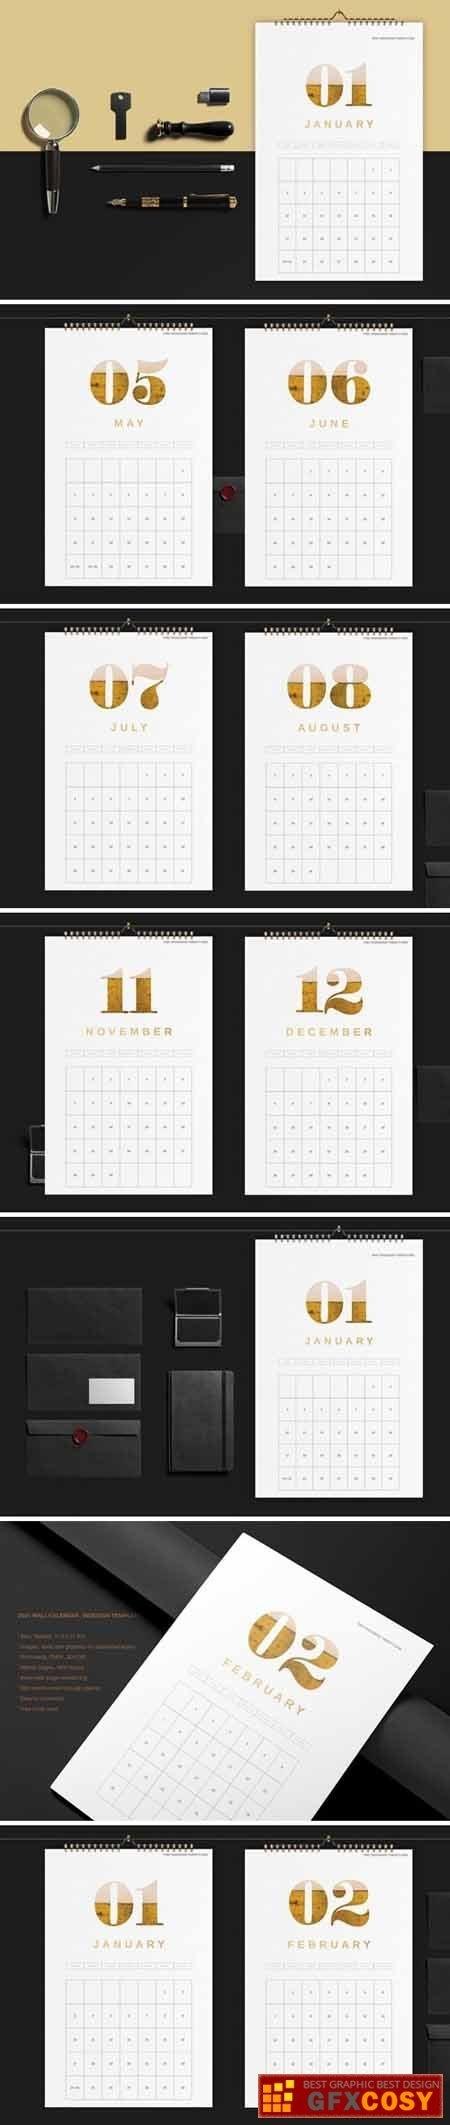 Wall Calendar 2021 Template369 » Free Download Photoshop Vector Stock Image Via Zippyshare pertaining to Indesign Calendar Template 2021 Graphics